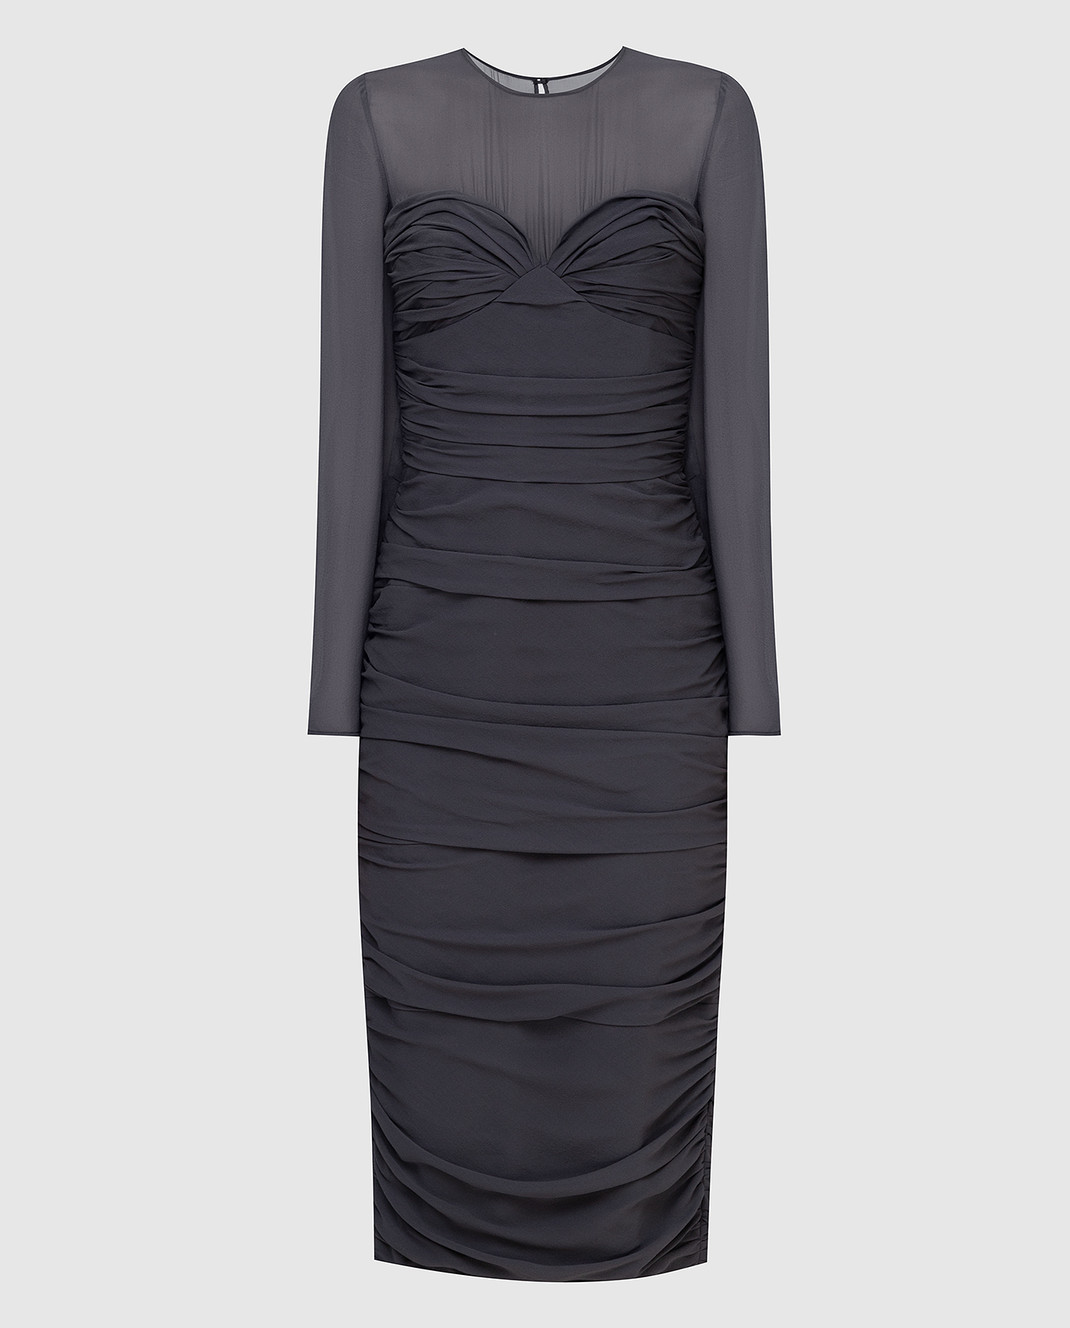 Max Mara Темно-серое платье из шелка ODER